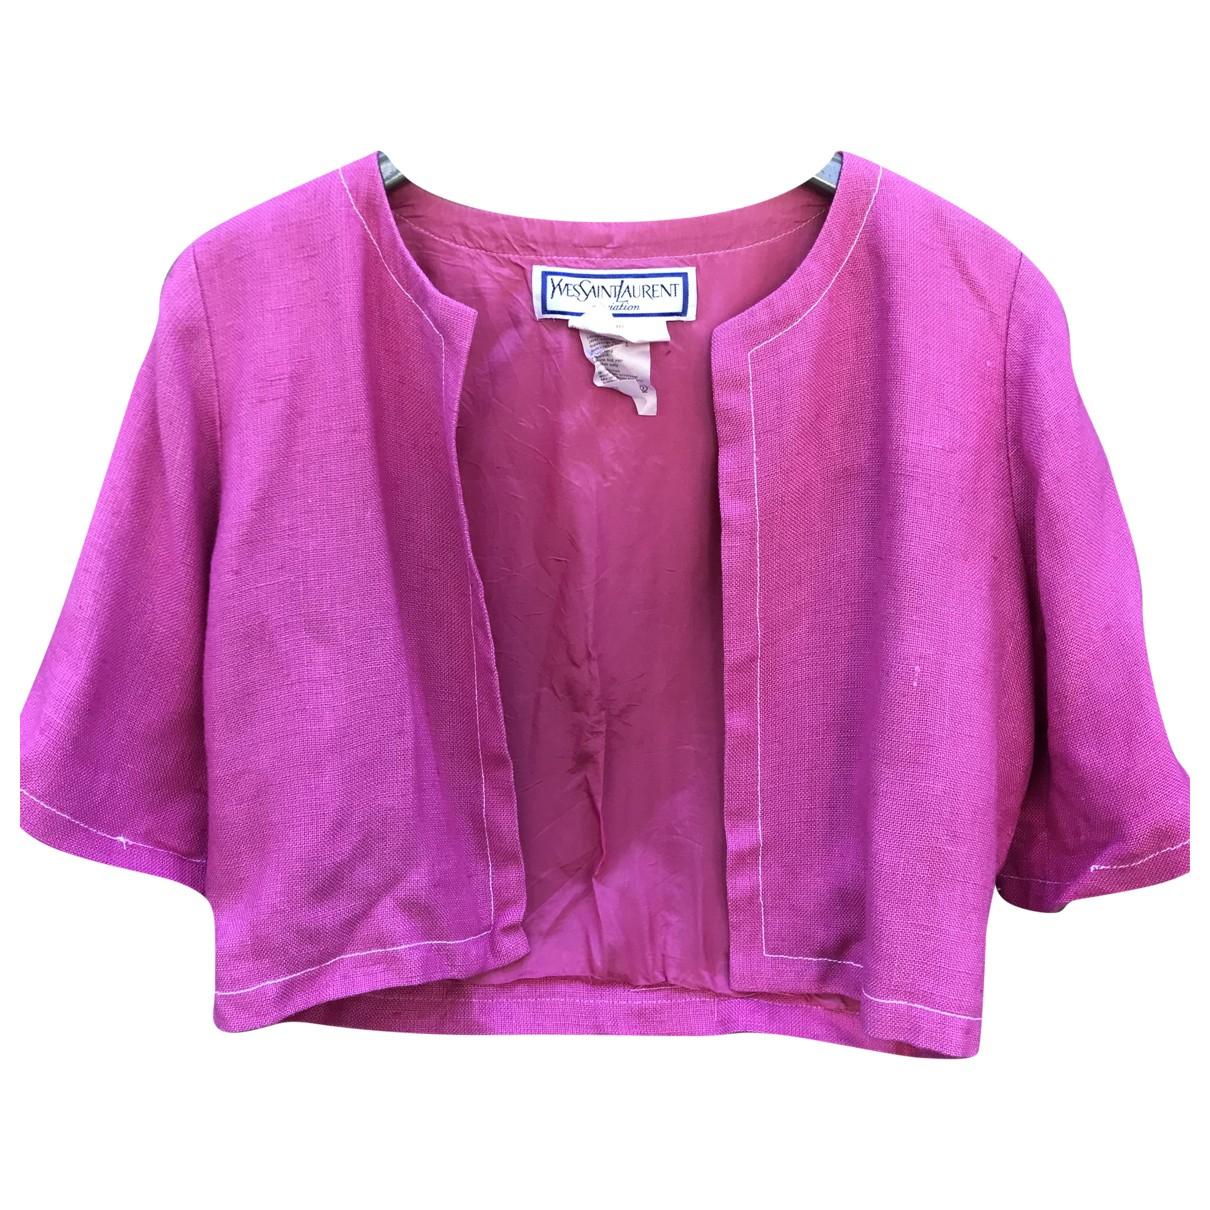 Yves Saint Laurent \N Pink jacket for Women 40 FR